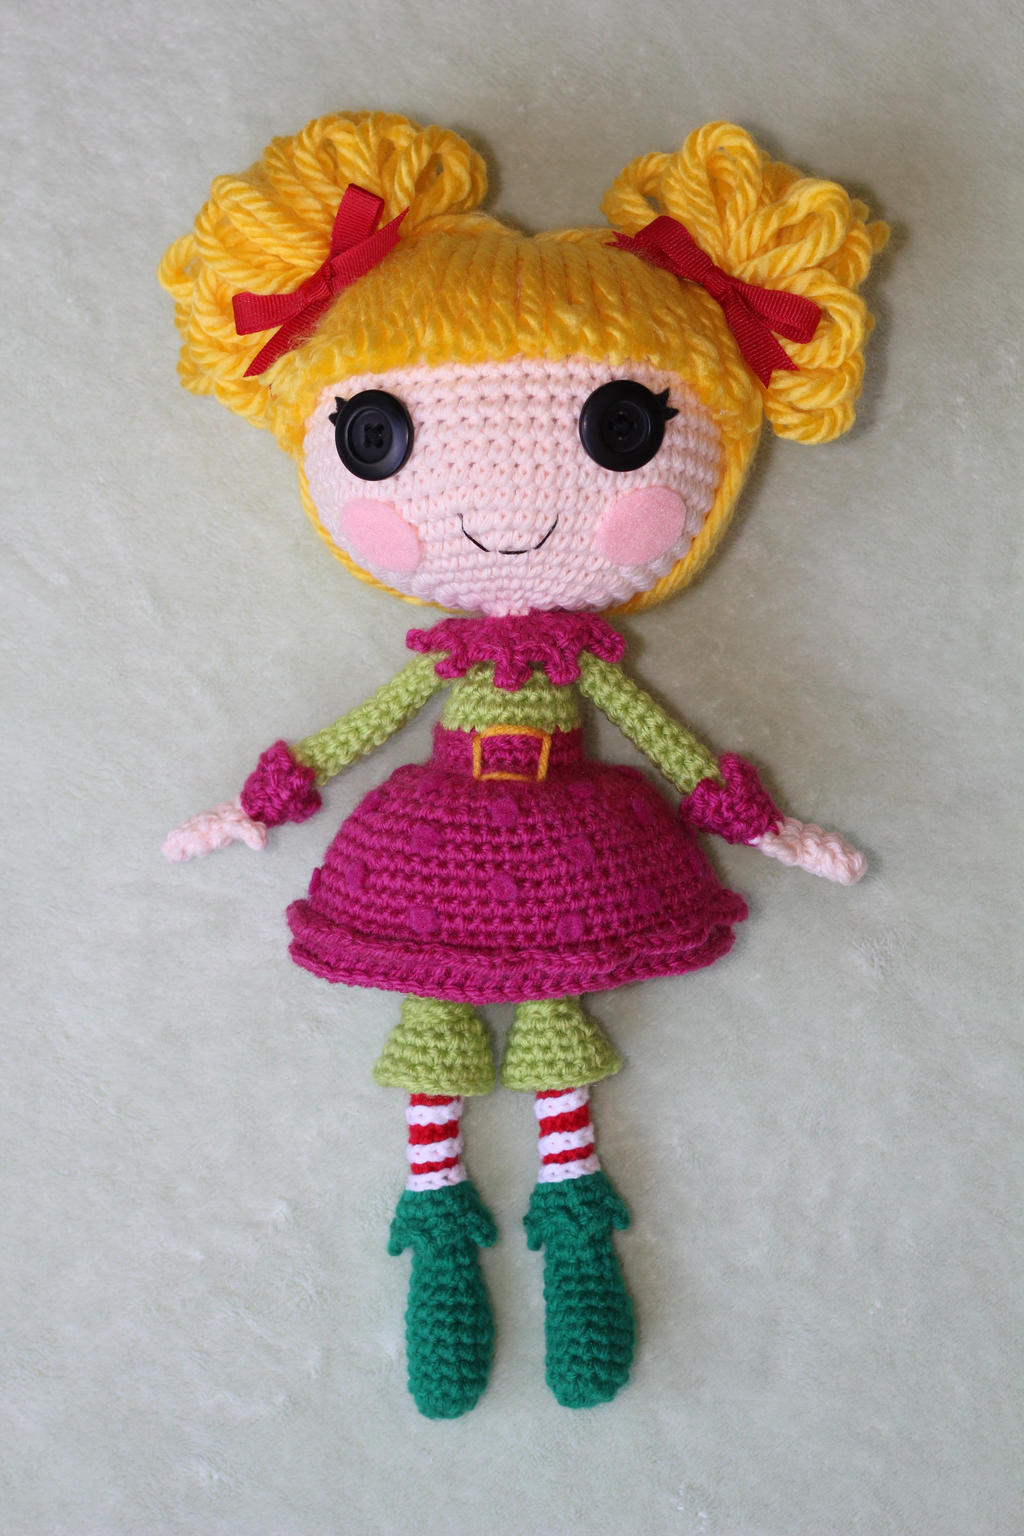 Sock Monkey Amigurumi Pattern : LALALOOPSY Holly Sleighbells Amigurumi Doll by Npantz22 on ...